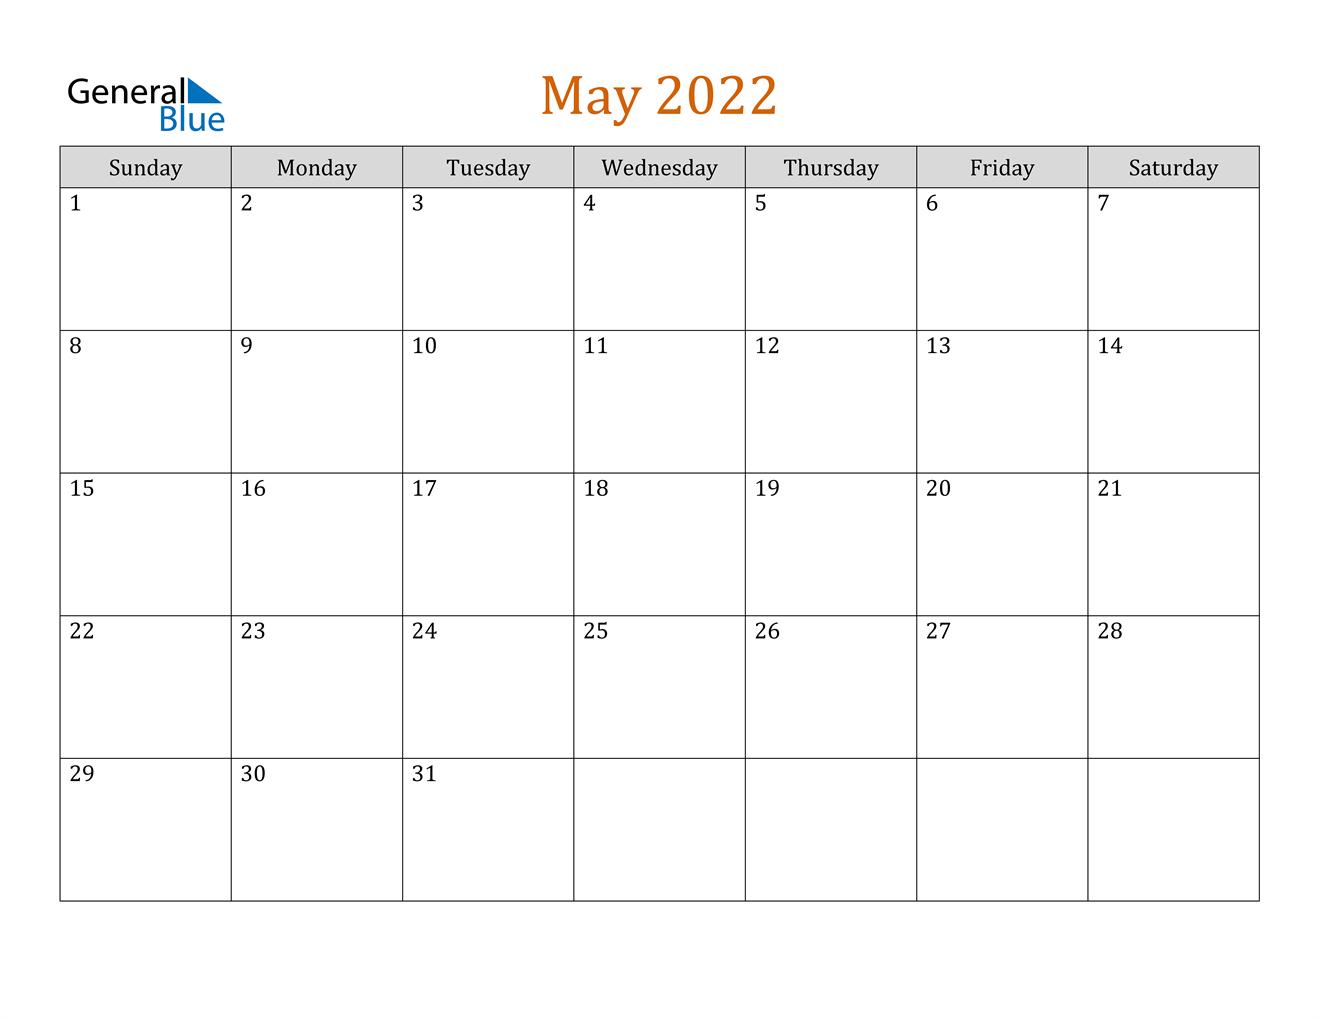 May 2022 Calendar - PDF Word Excel